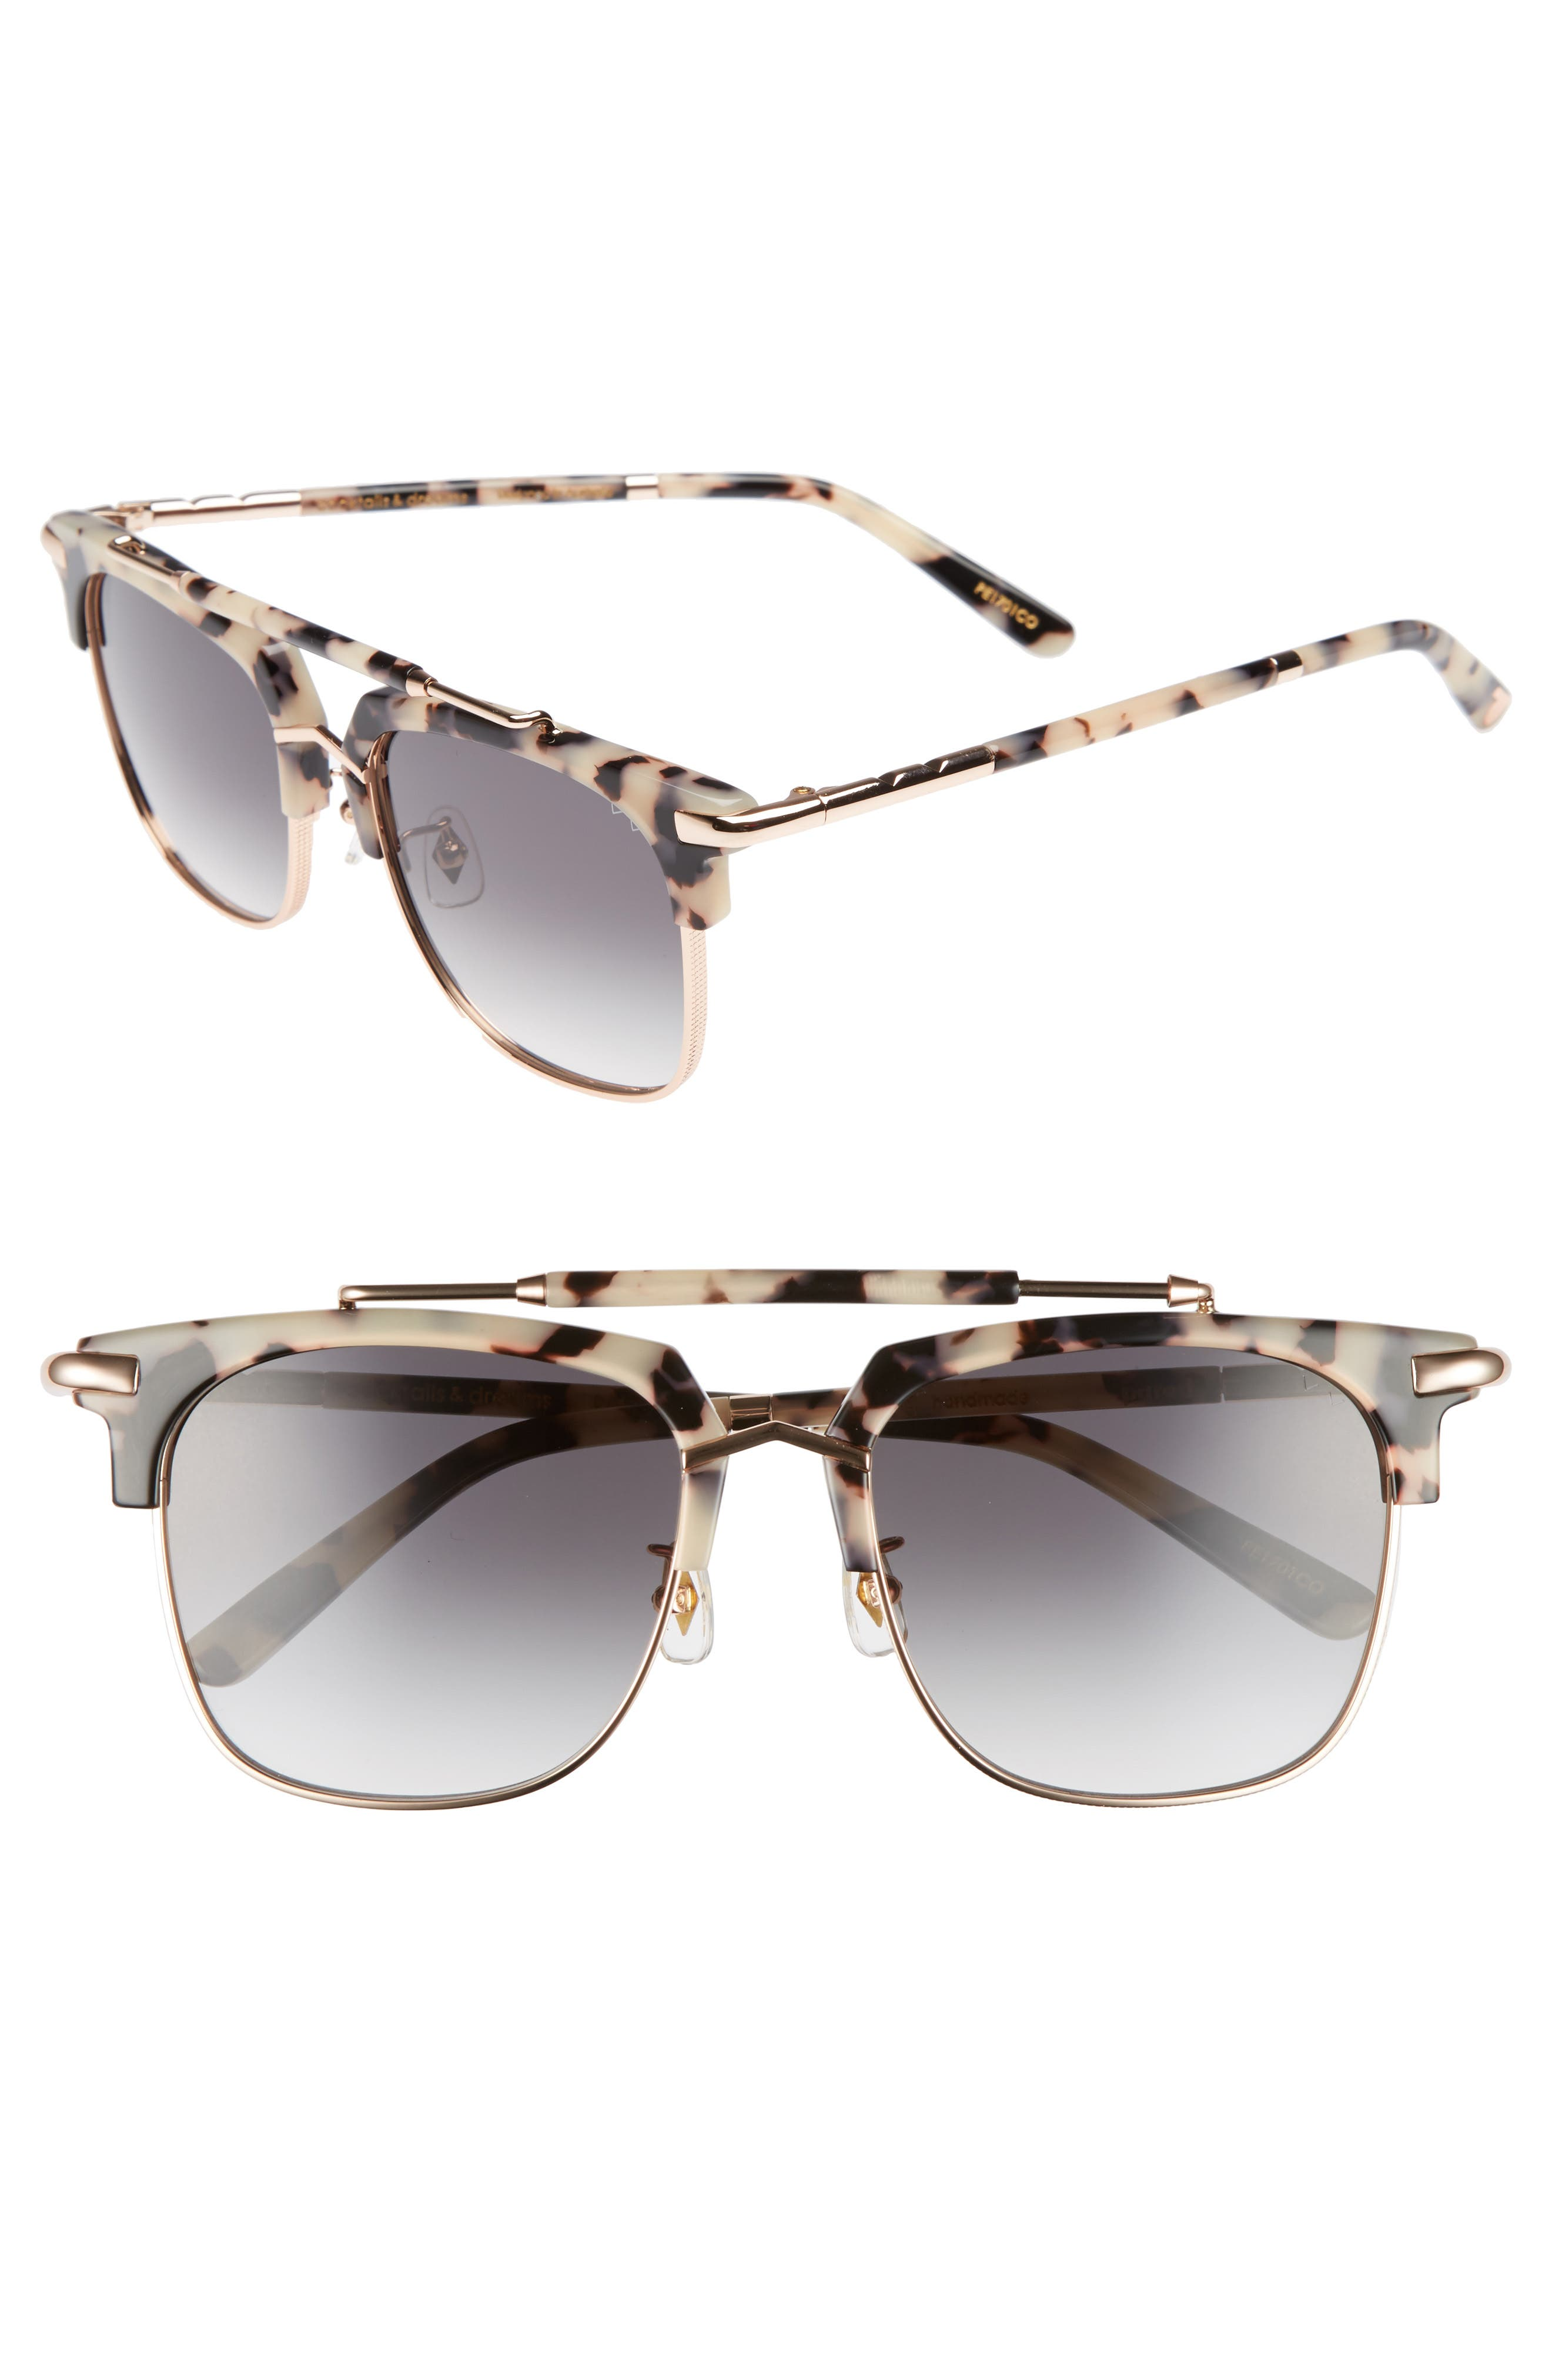 Pared Cocktails & Dreams 53mm Sunglasses